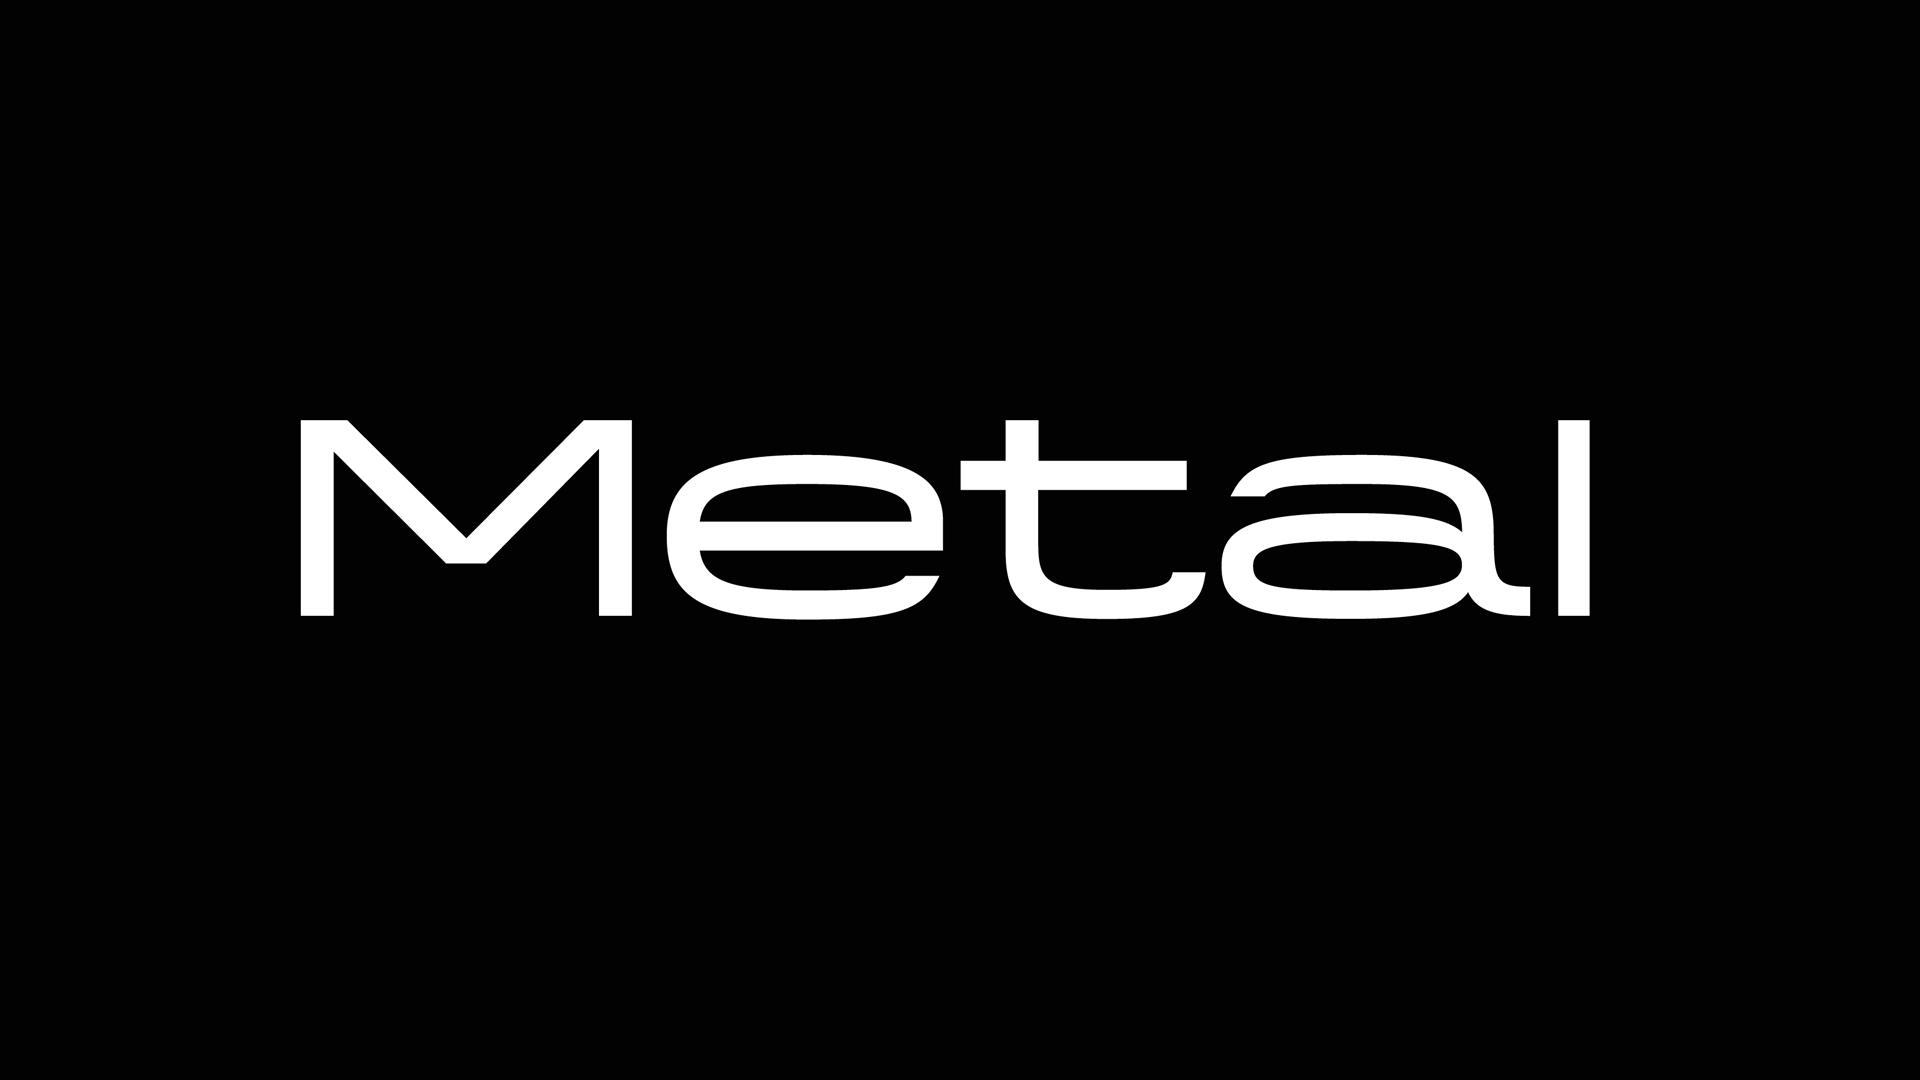 Шрифт Metal